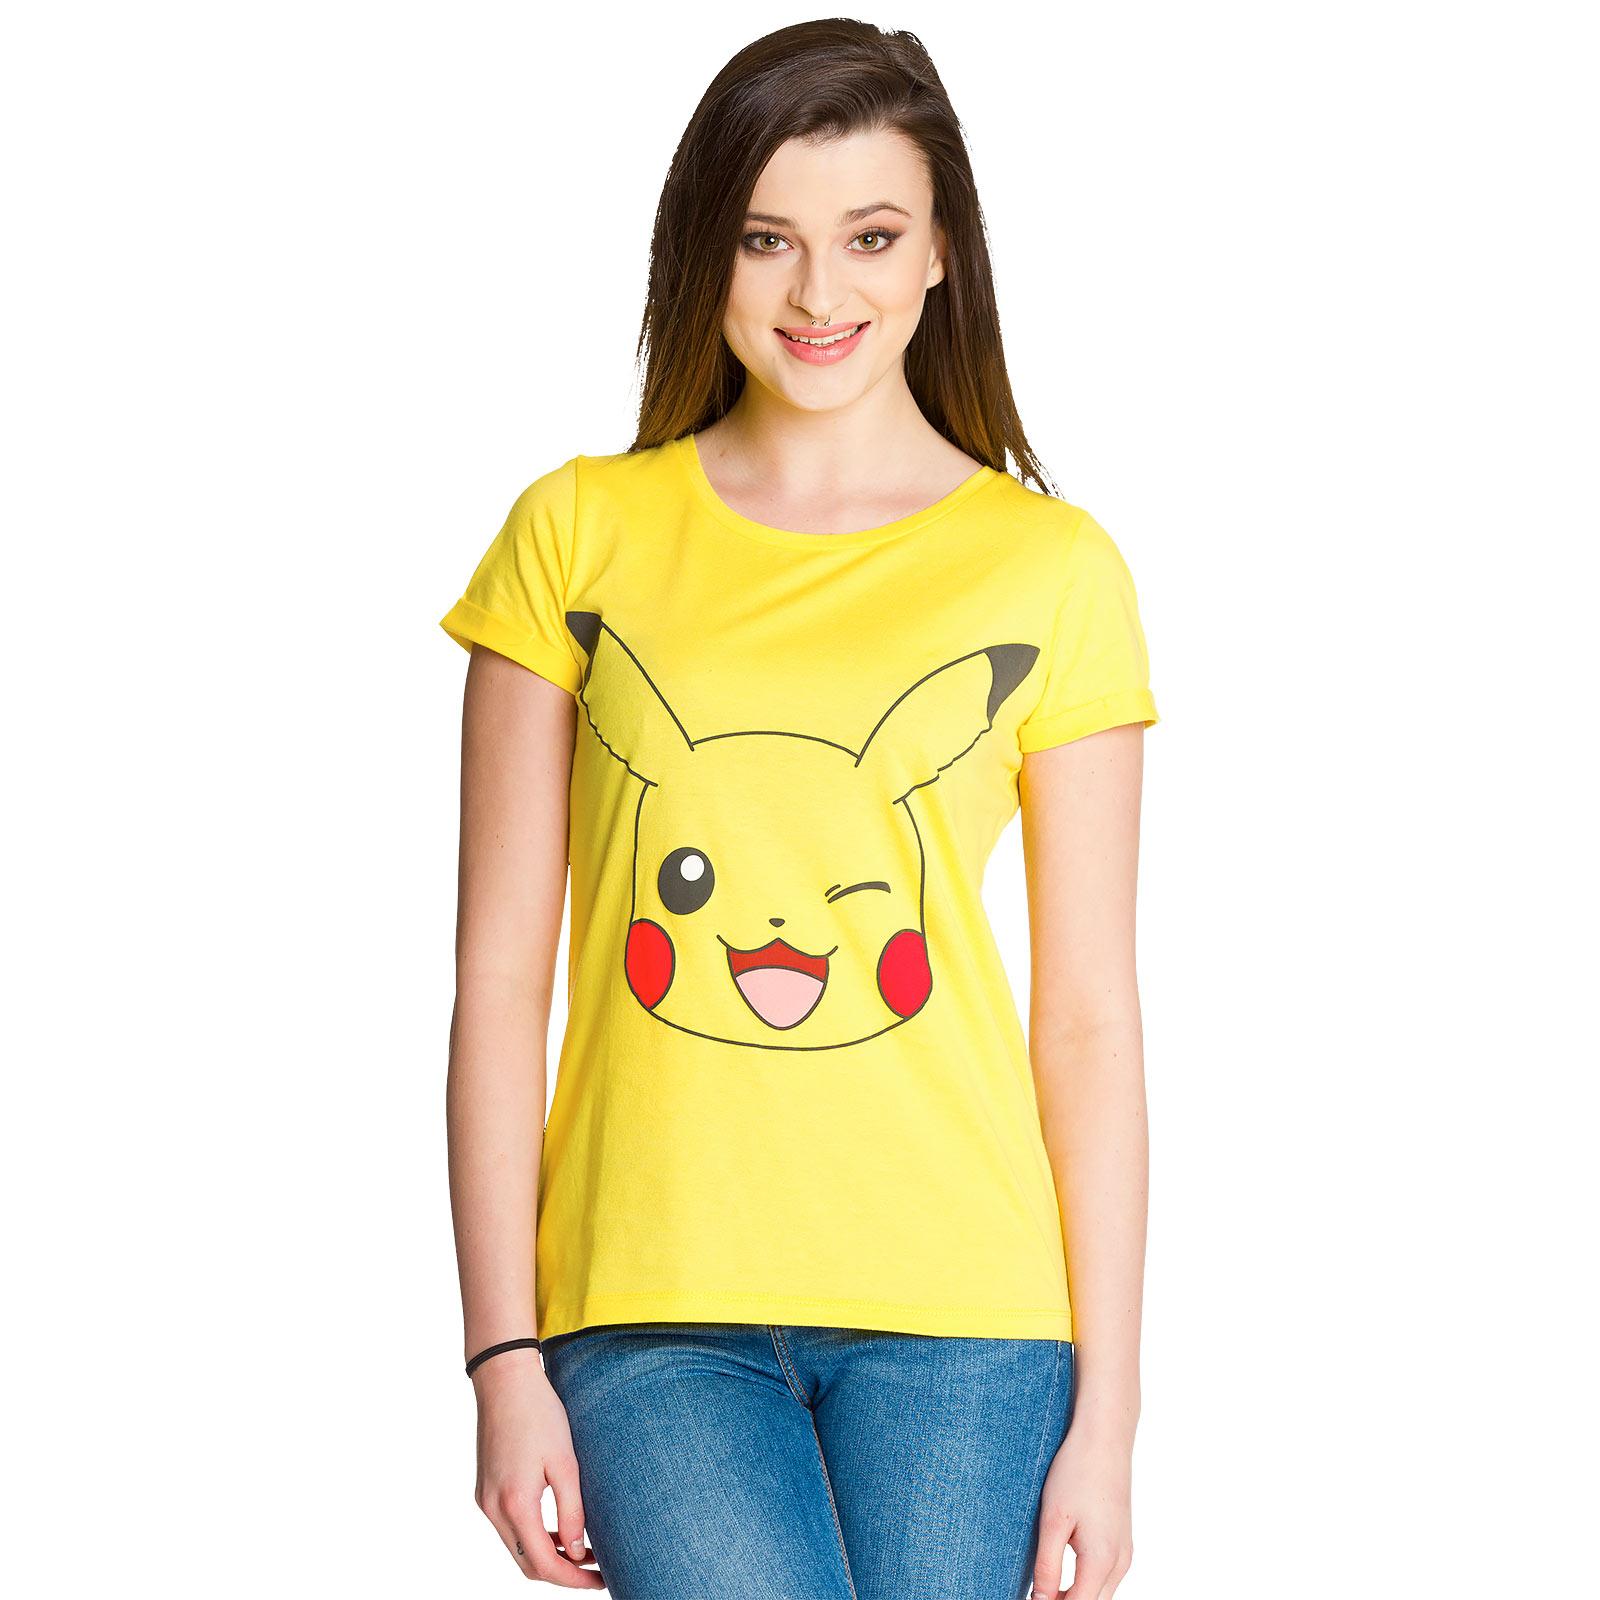 Pokemon - Pikachu Girlie Shirt gelb